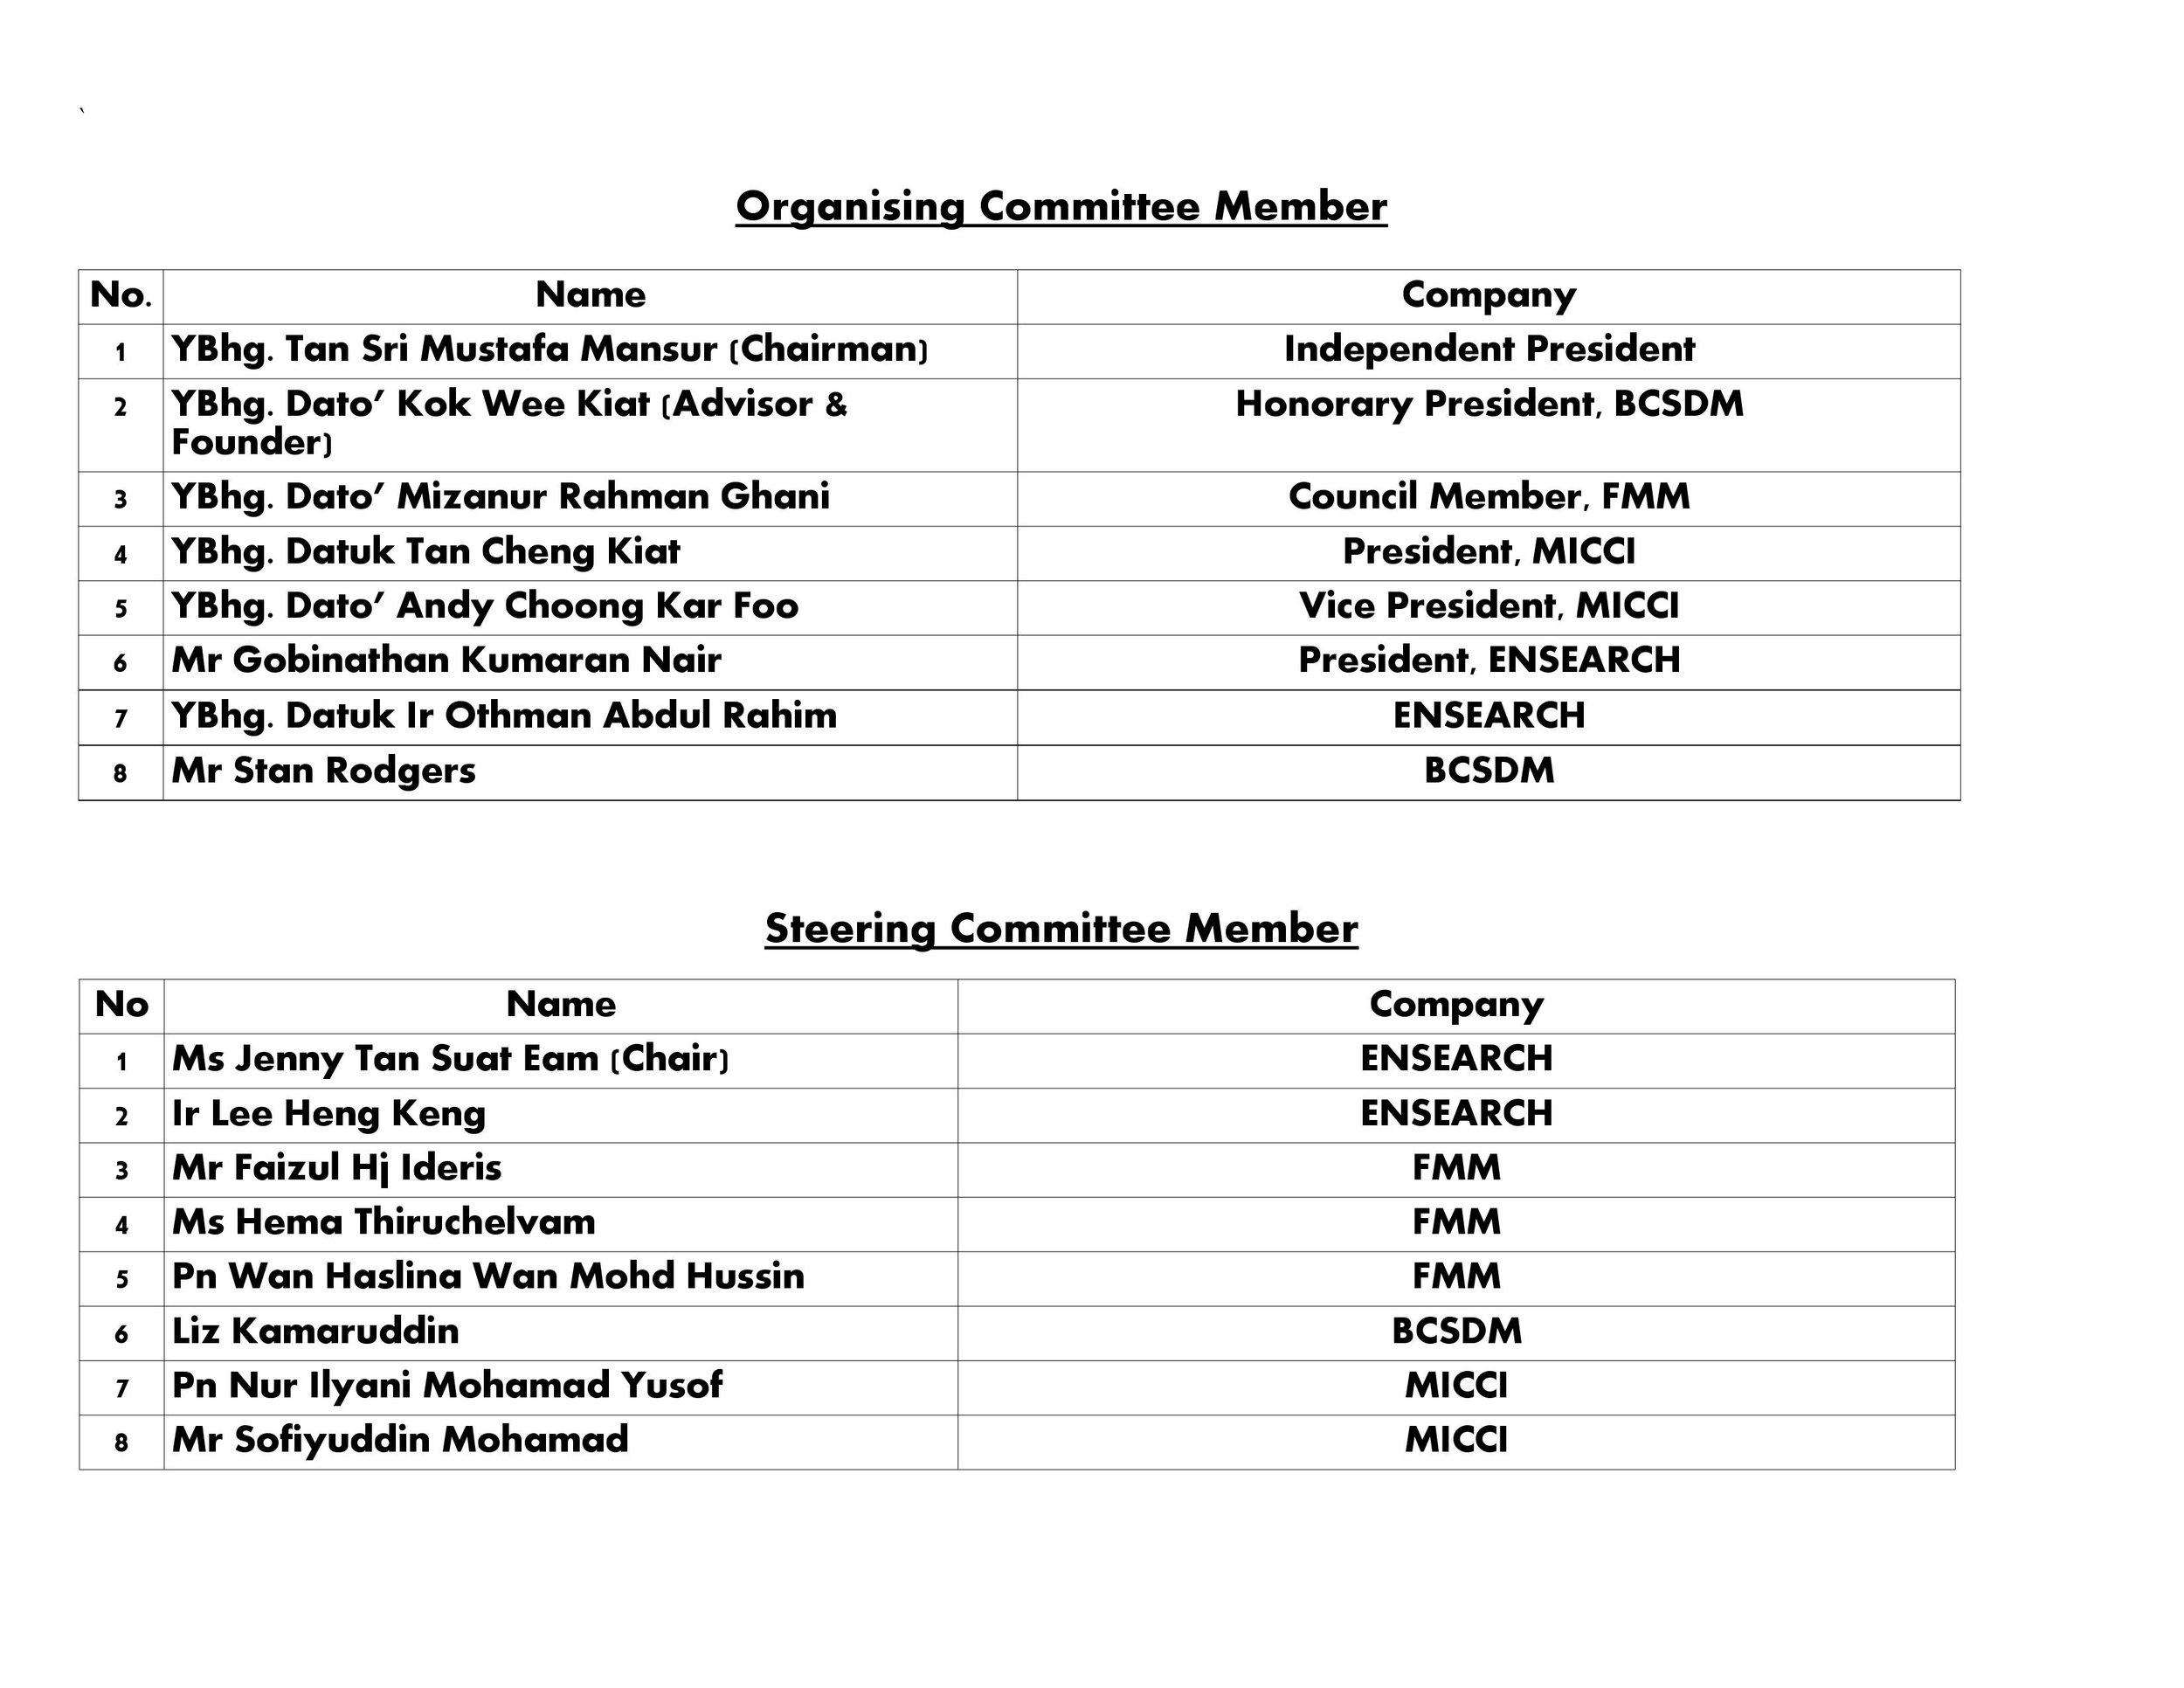 Steering Committee & OrganizingCommittee List2019.jpg